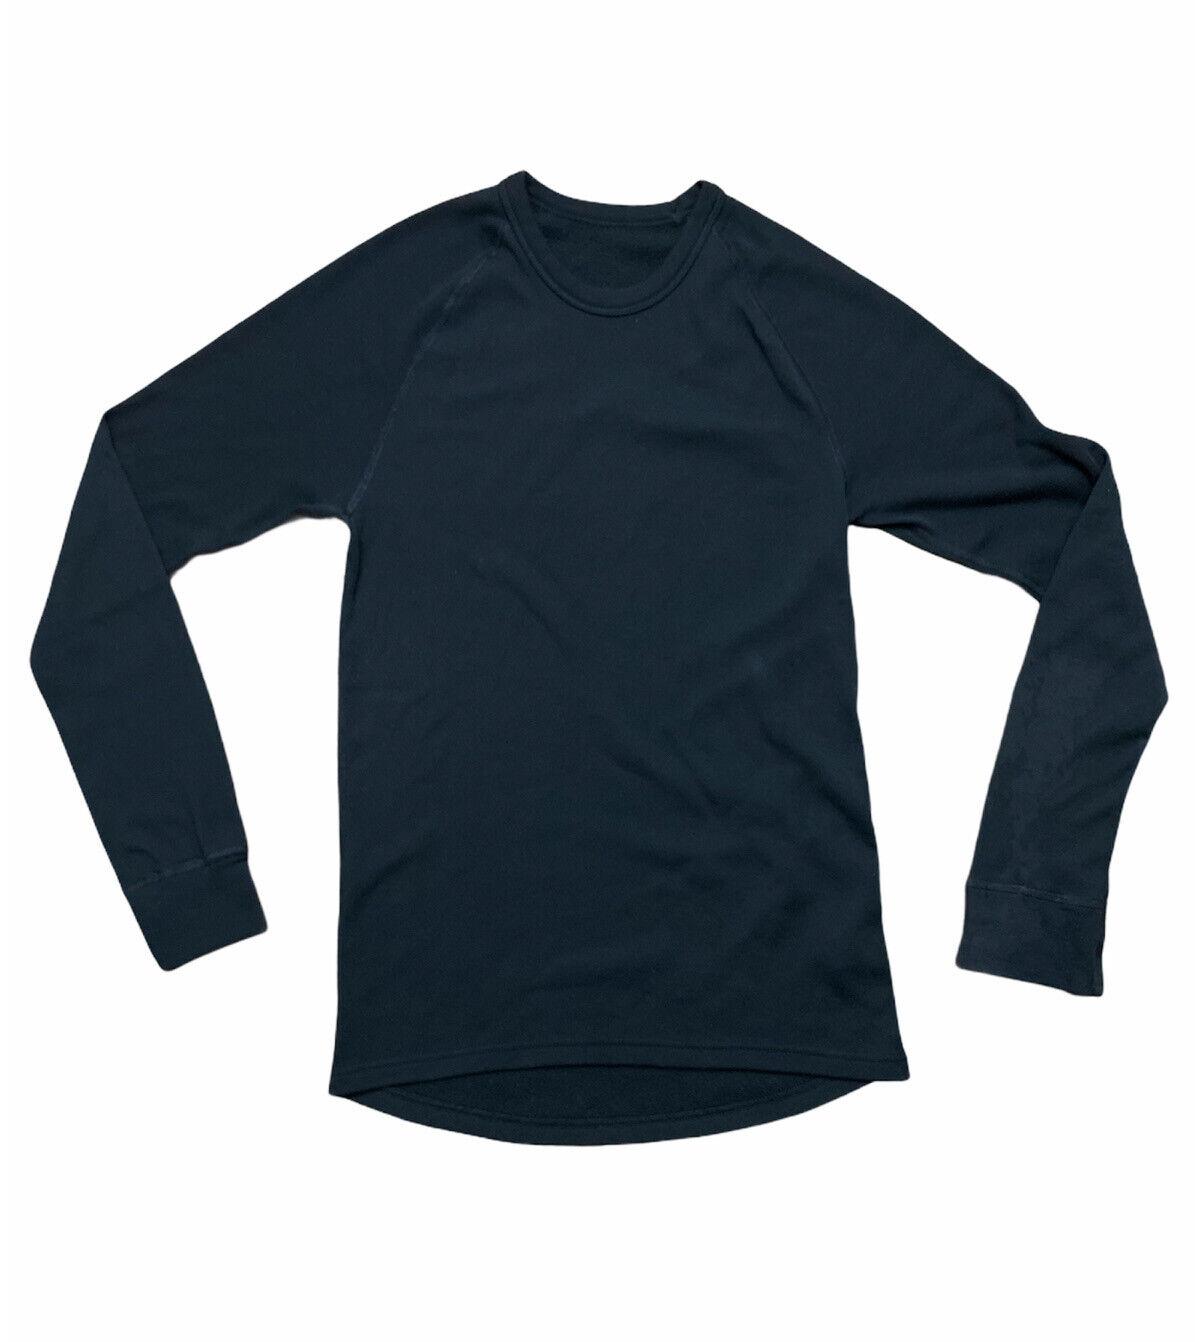 Odlo Black Long Sleeve Fleece Lined Polyester Basic Womens Top Size Large